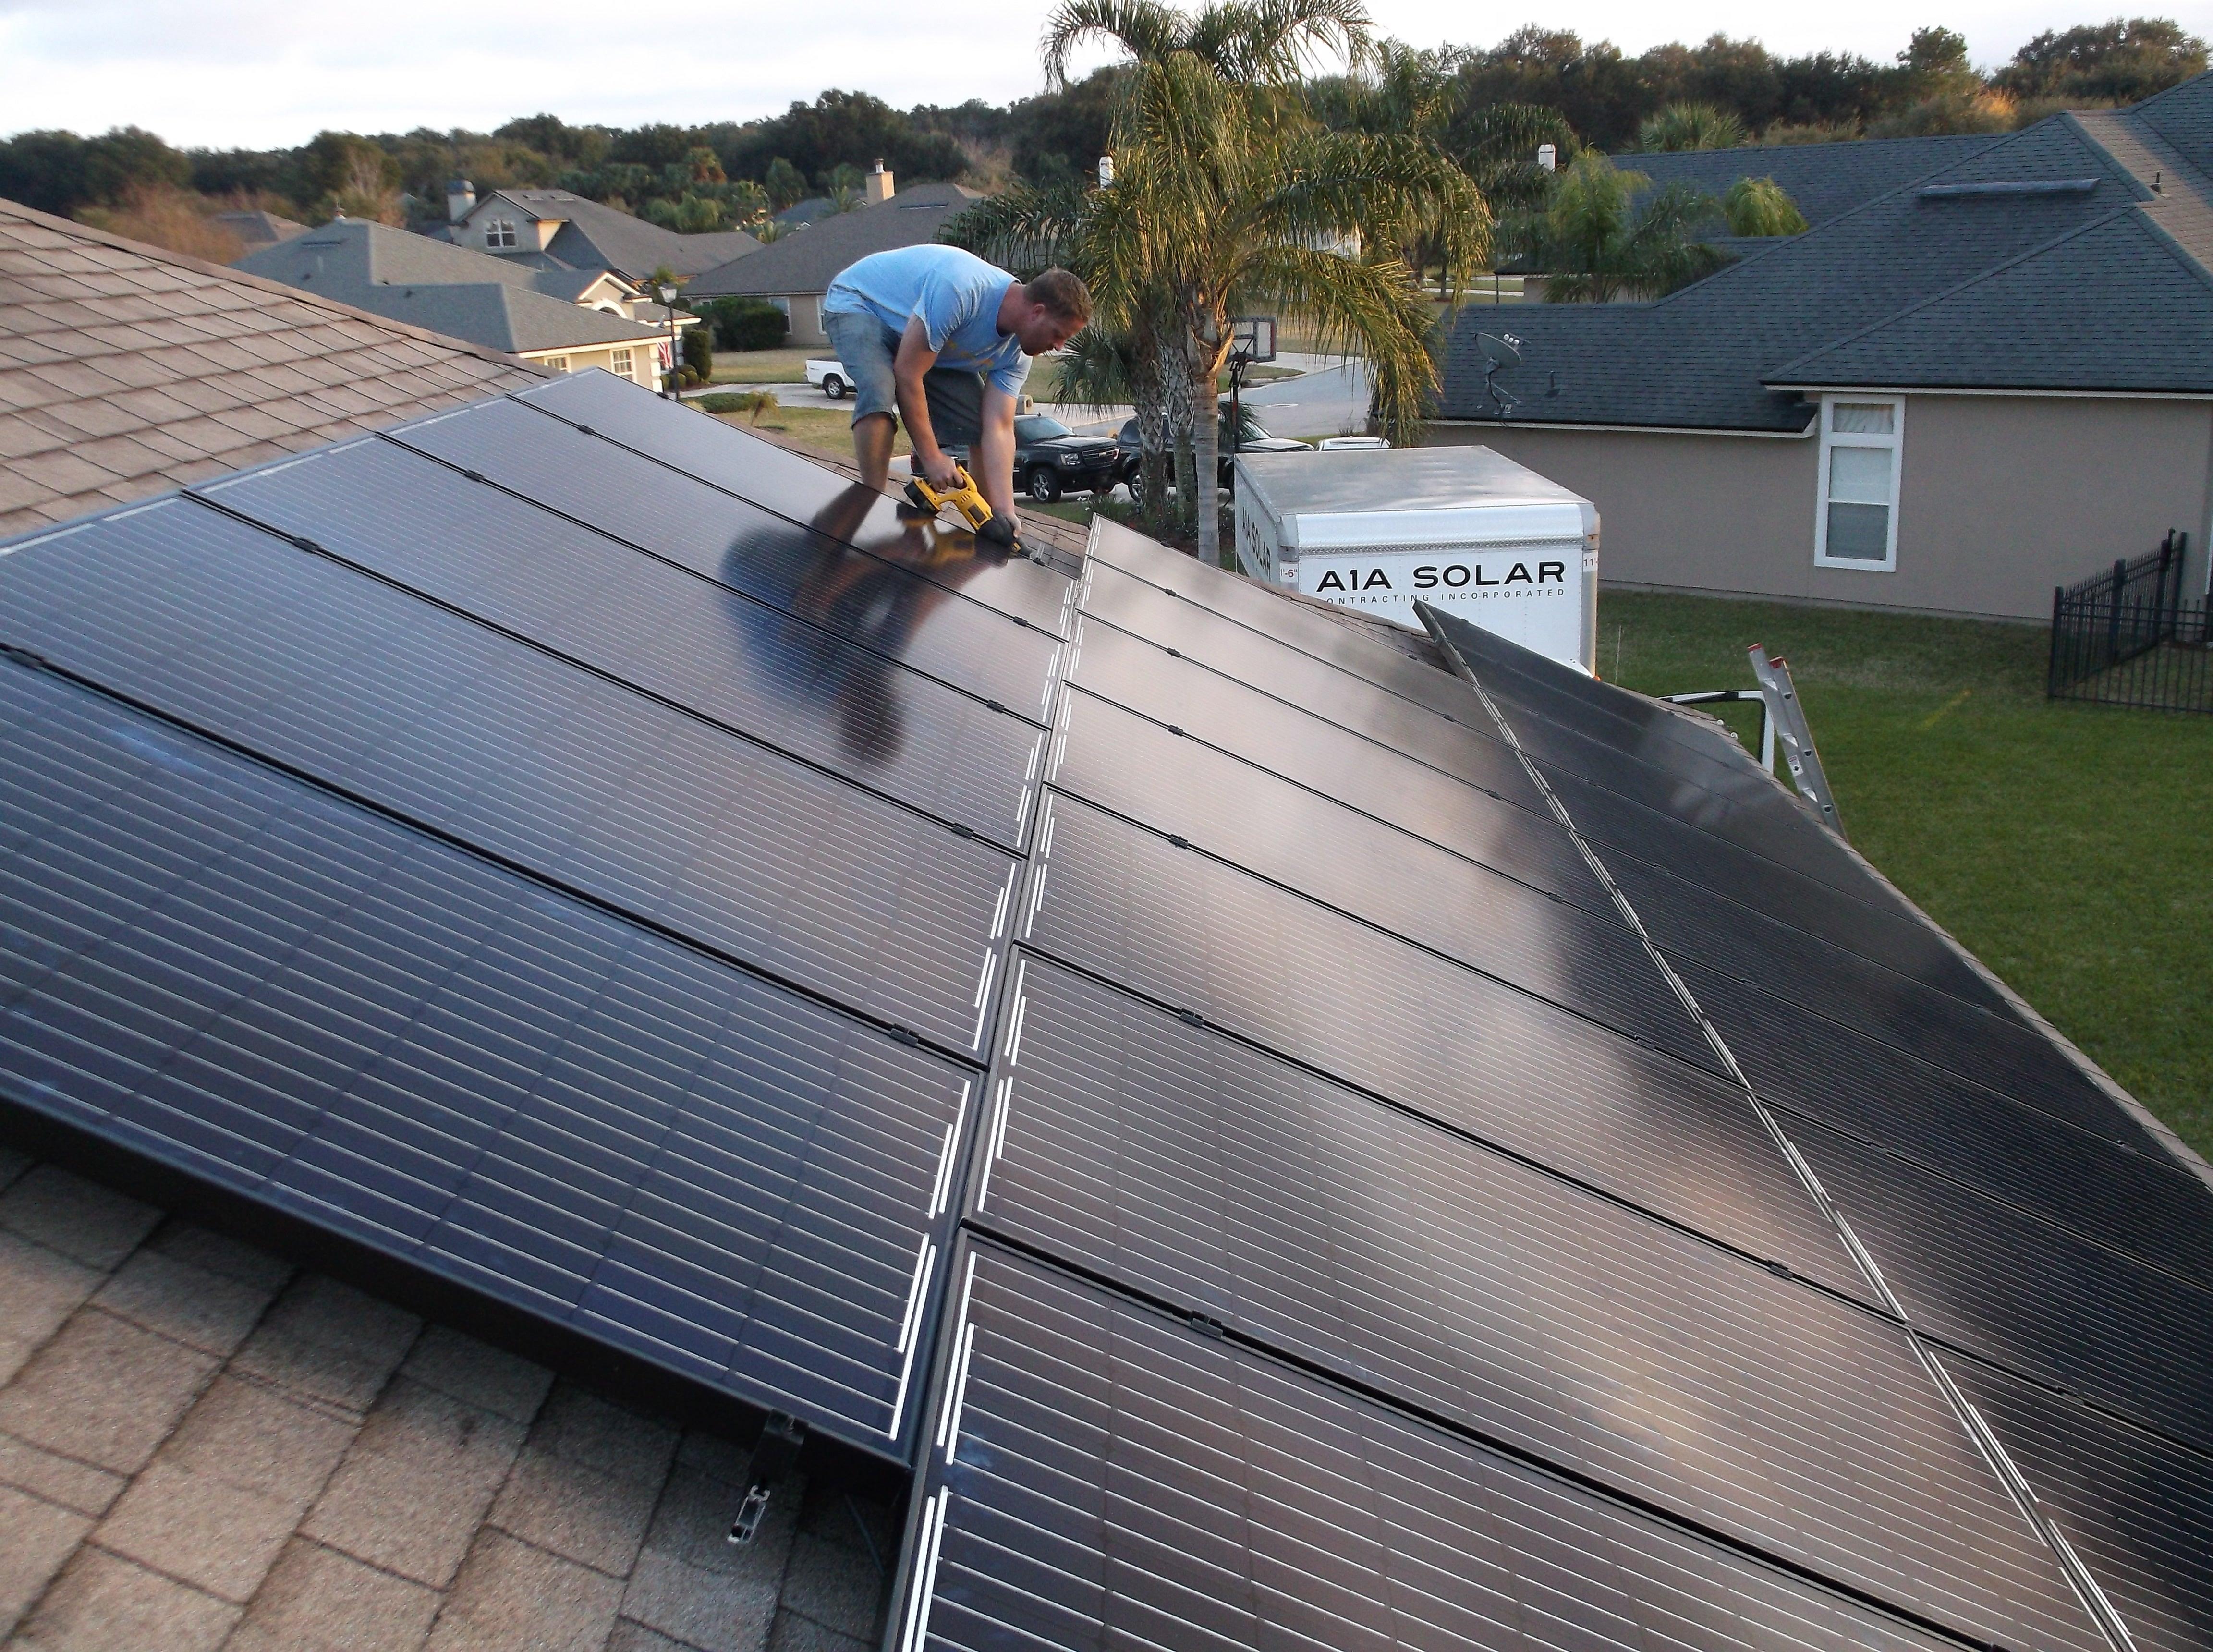 10.07KW residential PV installation in progress